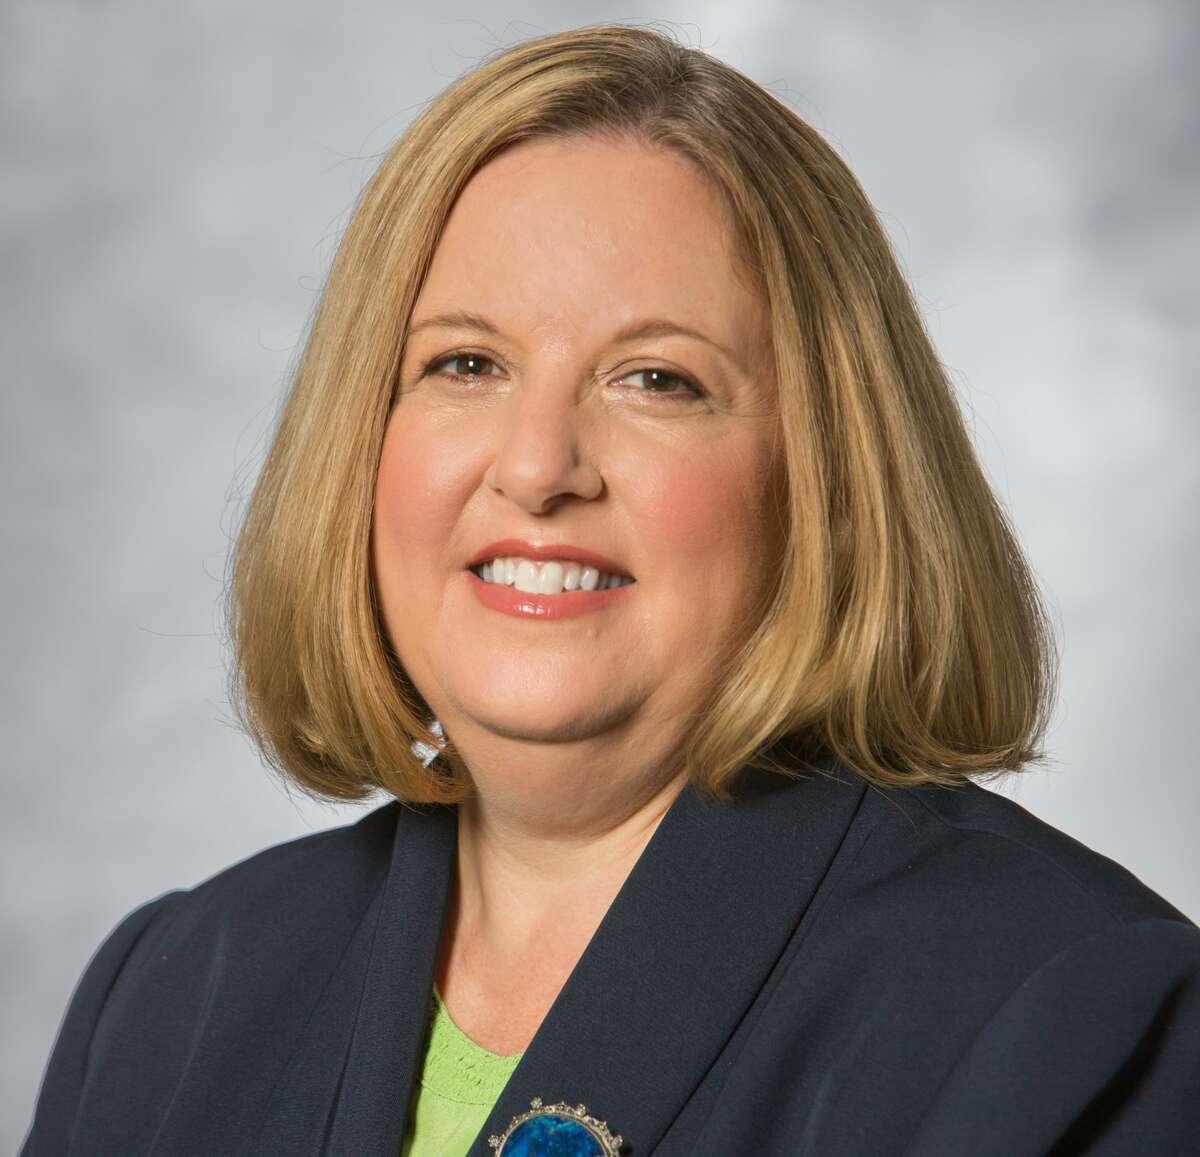 Jennifer Jackson of Madison, president and CEO, Connecticut Hospital Association and Affiliates